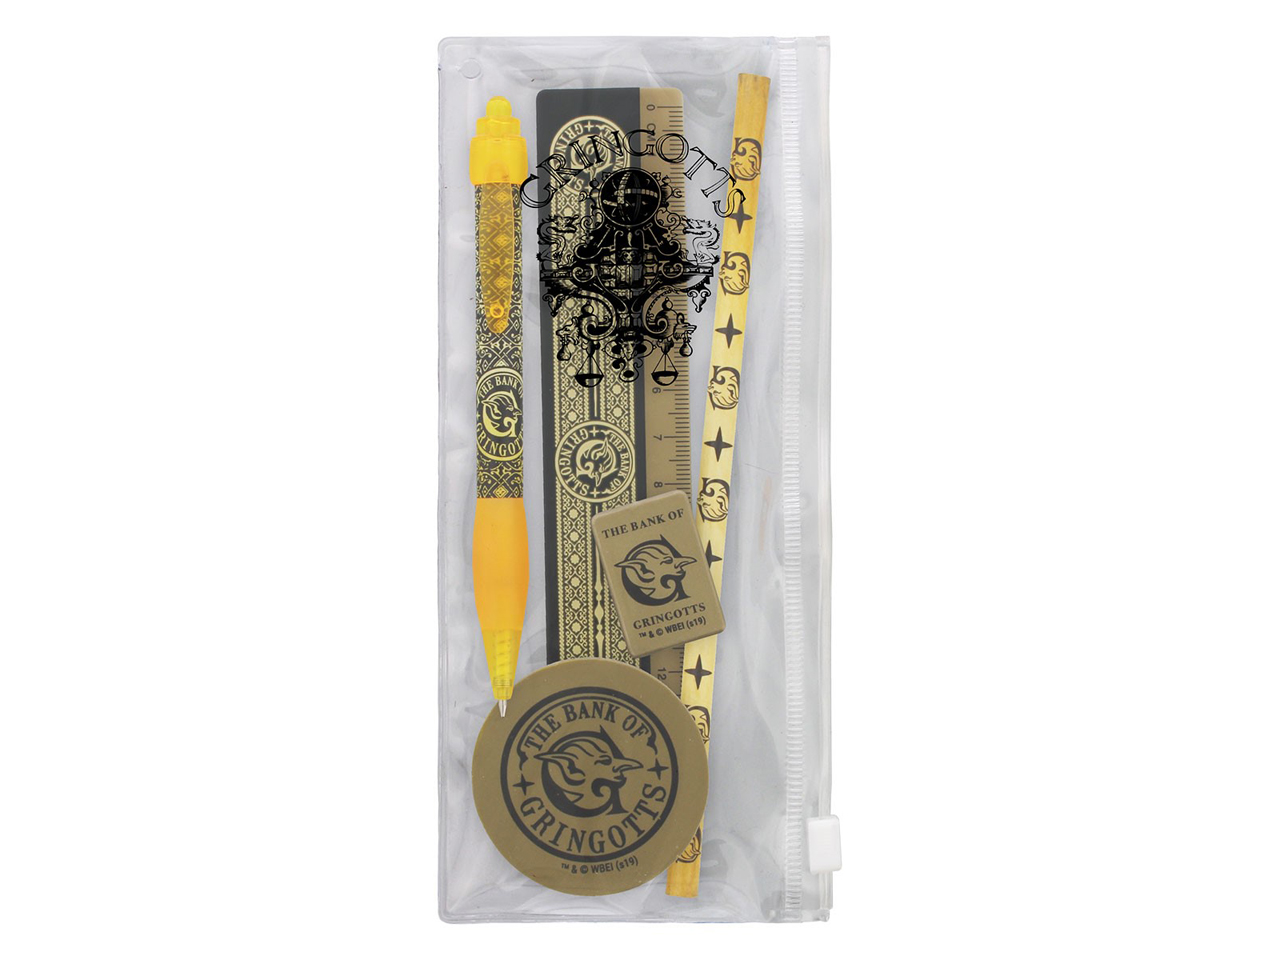 Harry Potter Gringotts Stationary Set Wizarding Bank Wizard Gold Coin Pen Pencil Eraser Sharpener Ruler Case School Office Official